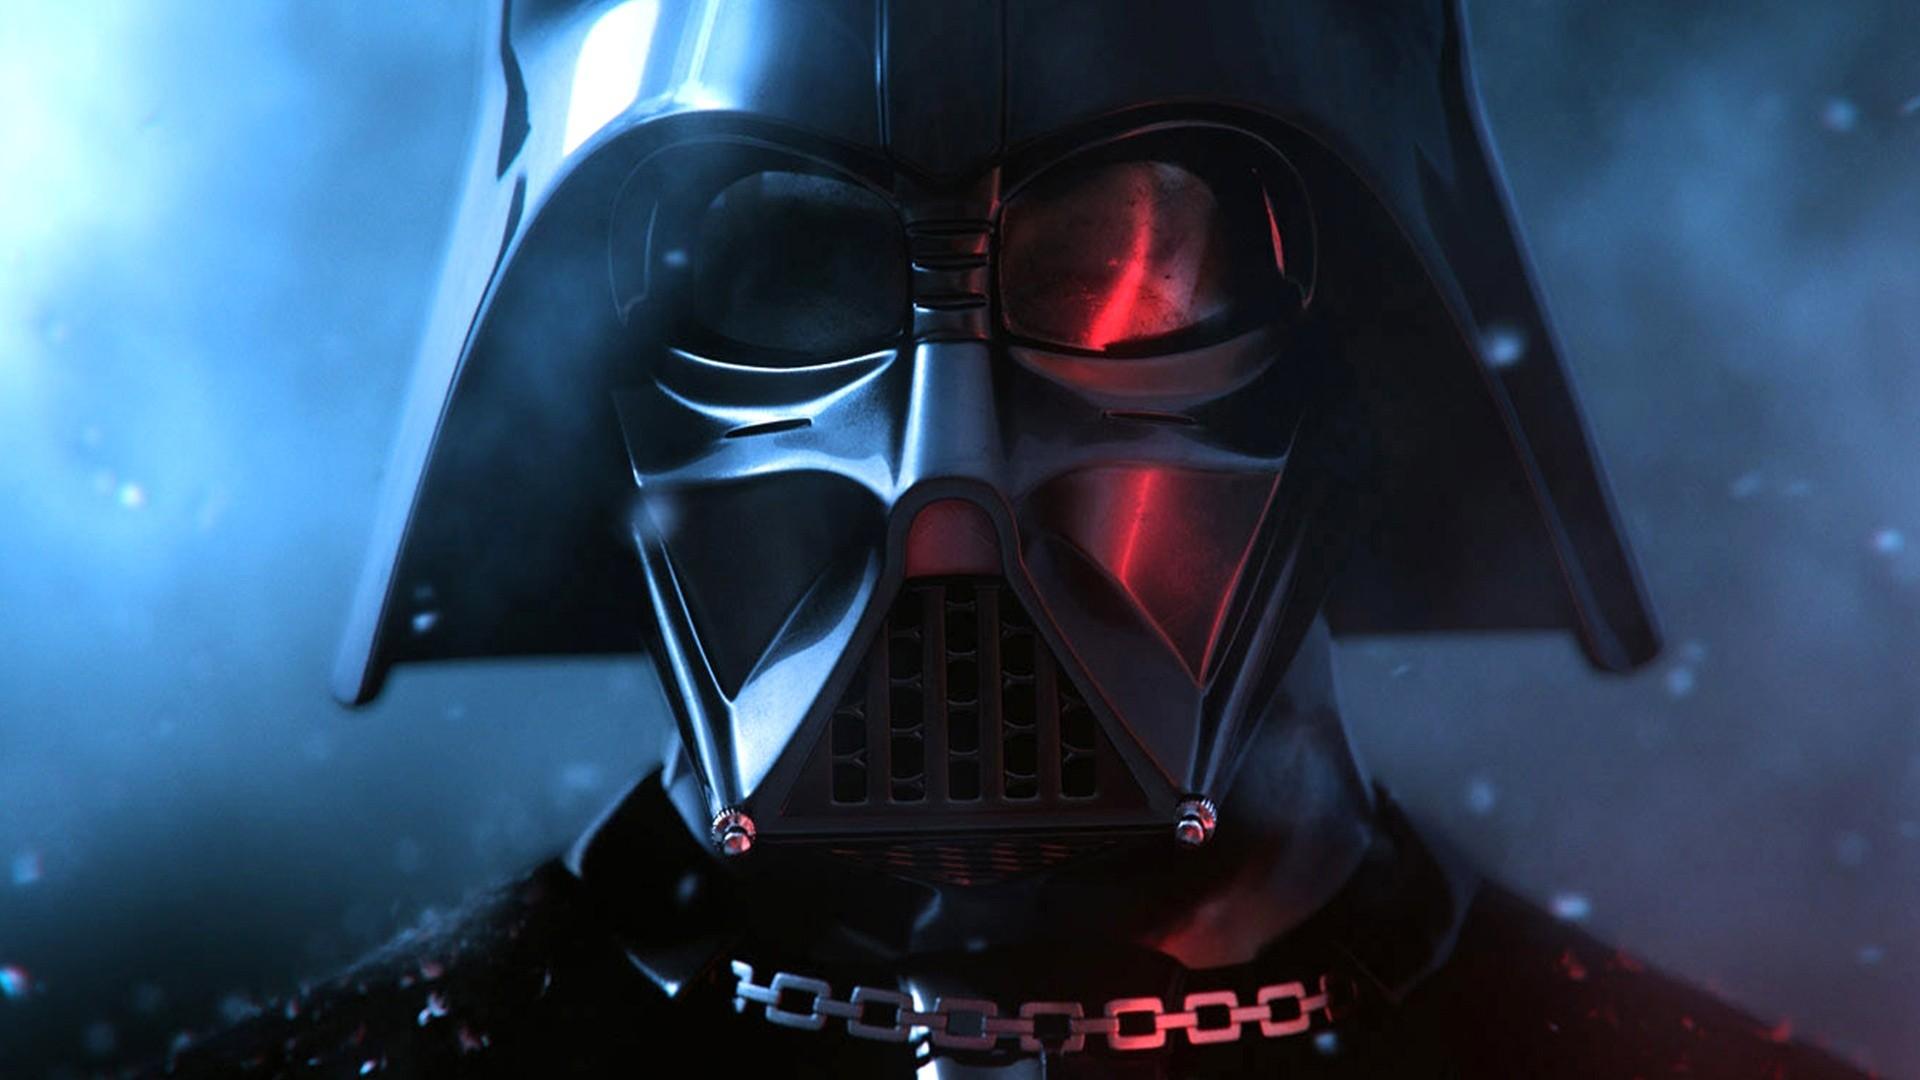 Star Wars Wallpaper 1920x1080 Star Wars Darth Vader Dark Side 1920x1080